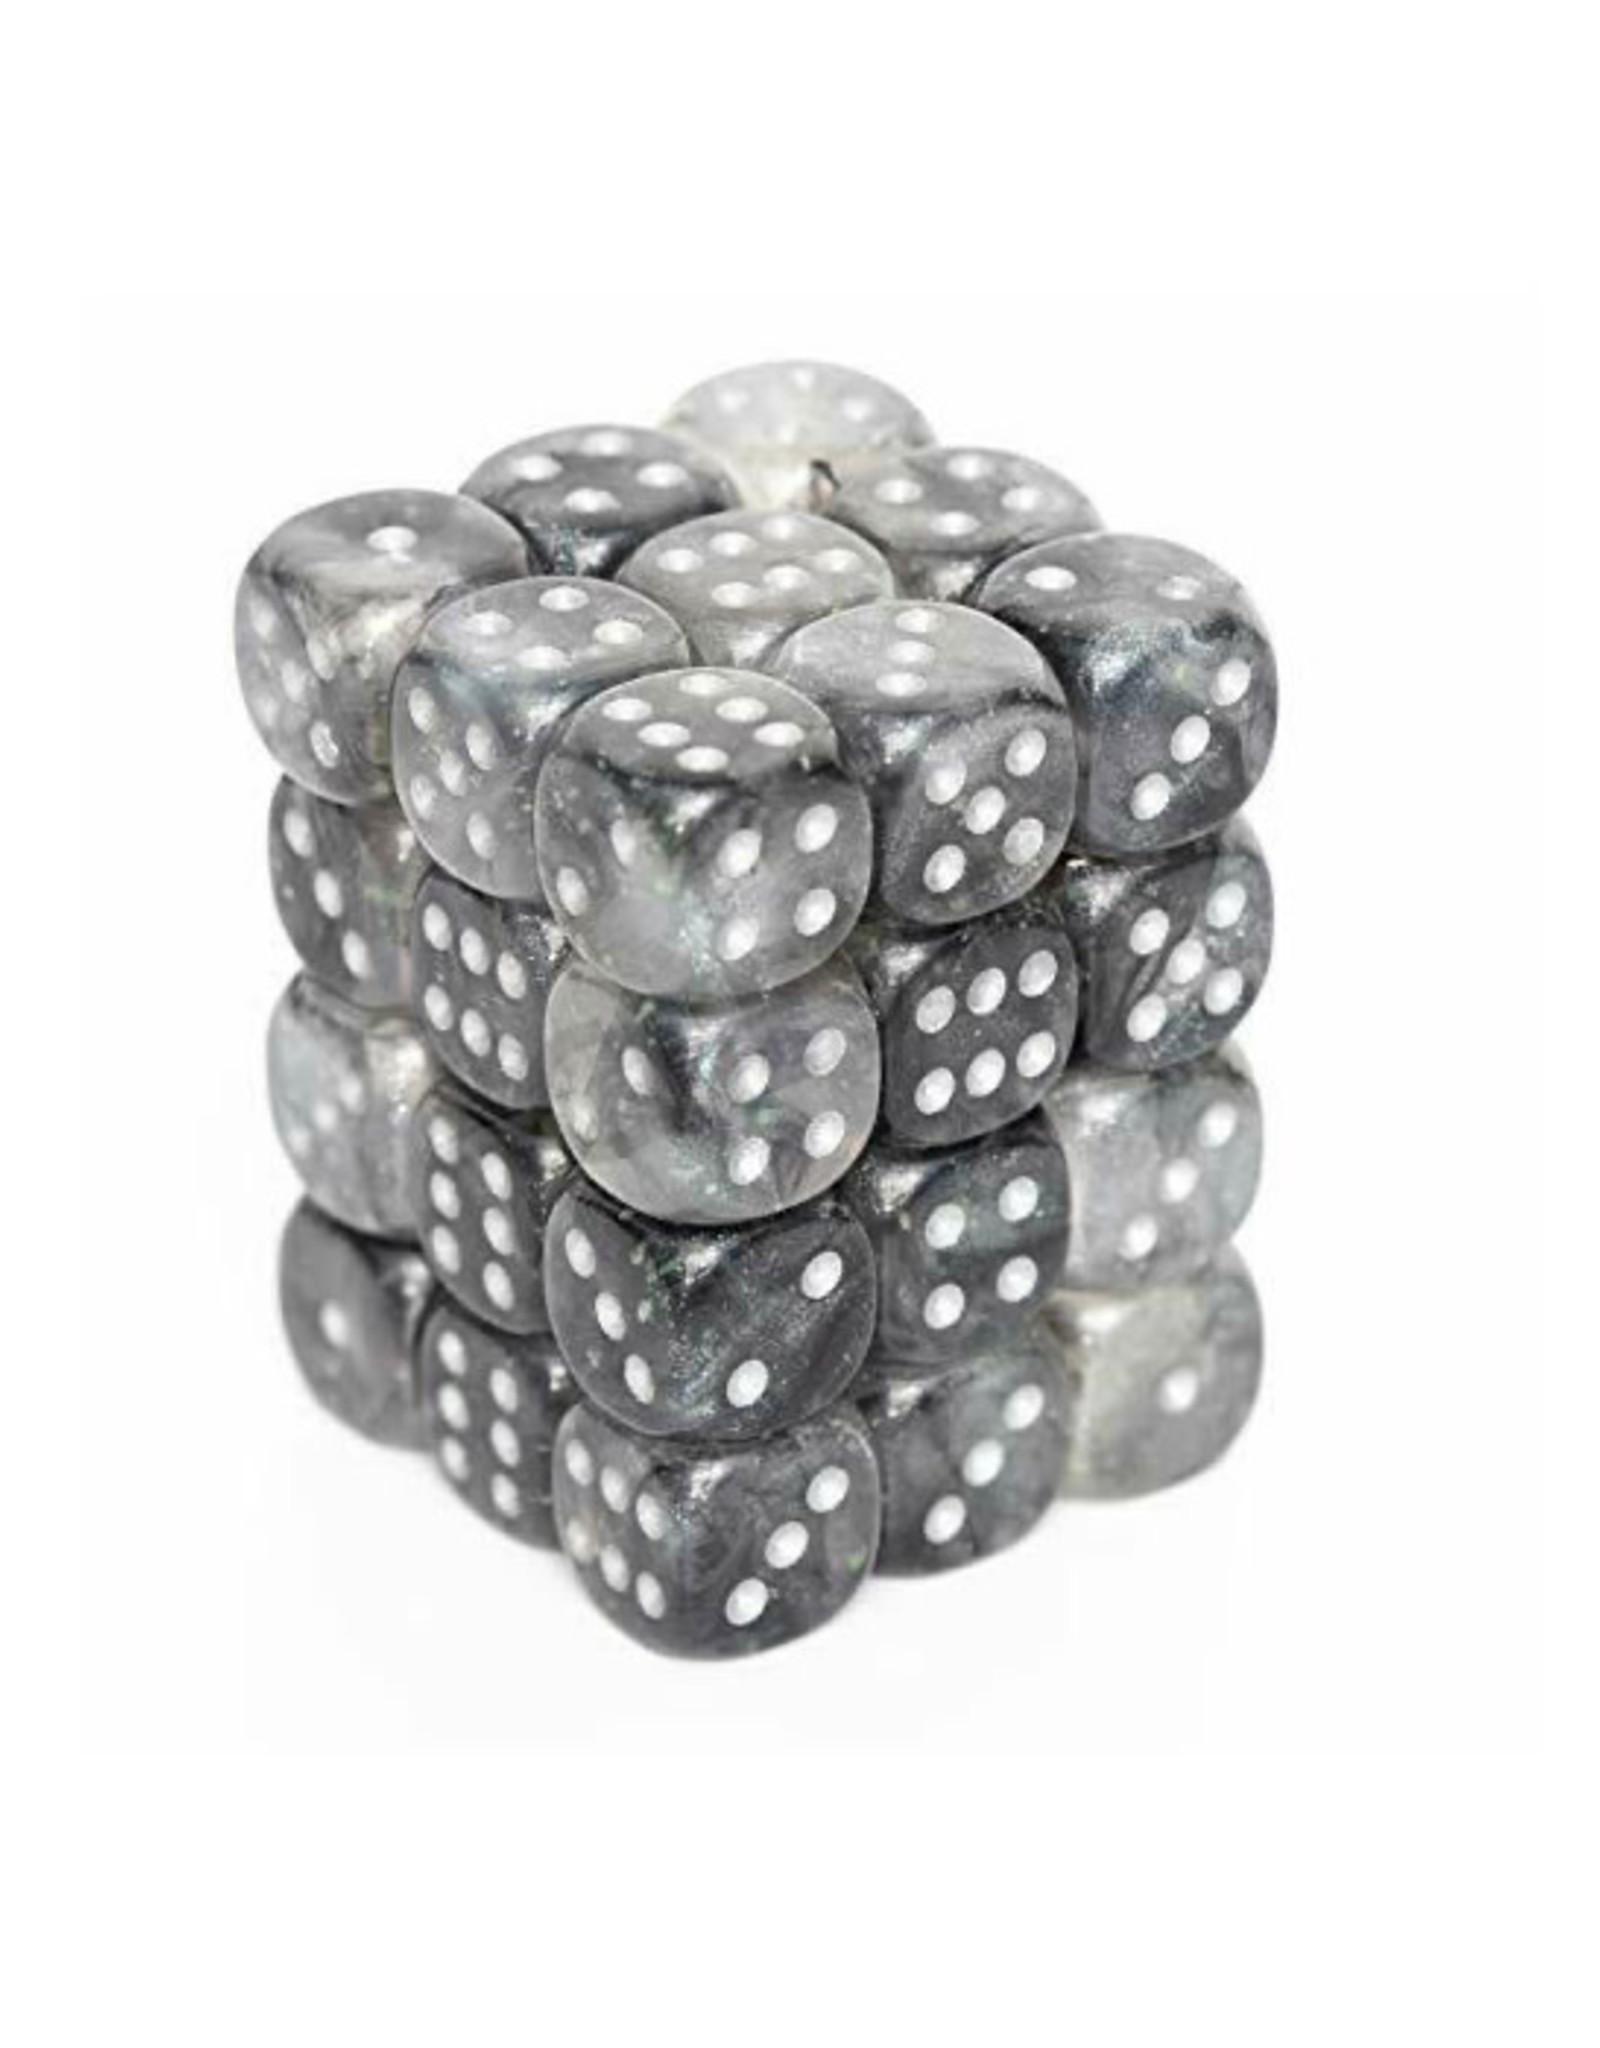 Chessex Chessex: 12mm D6 - Borealis - Light Smoke w/ Silver